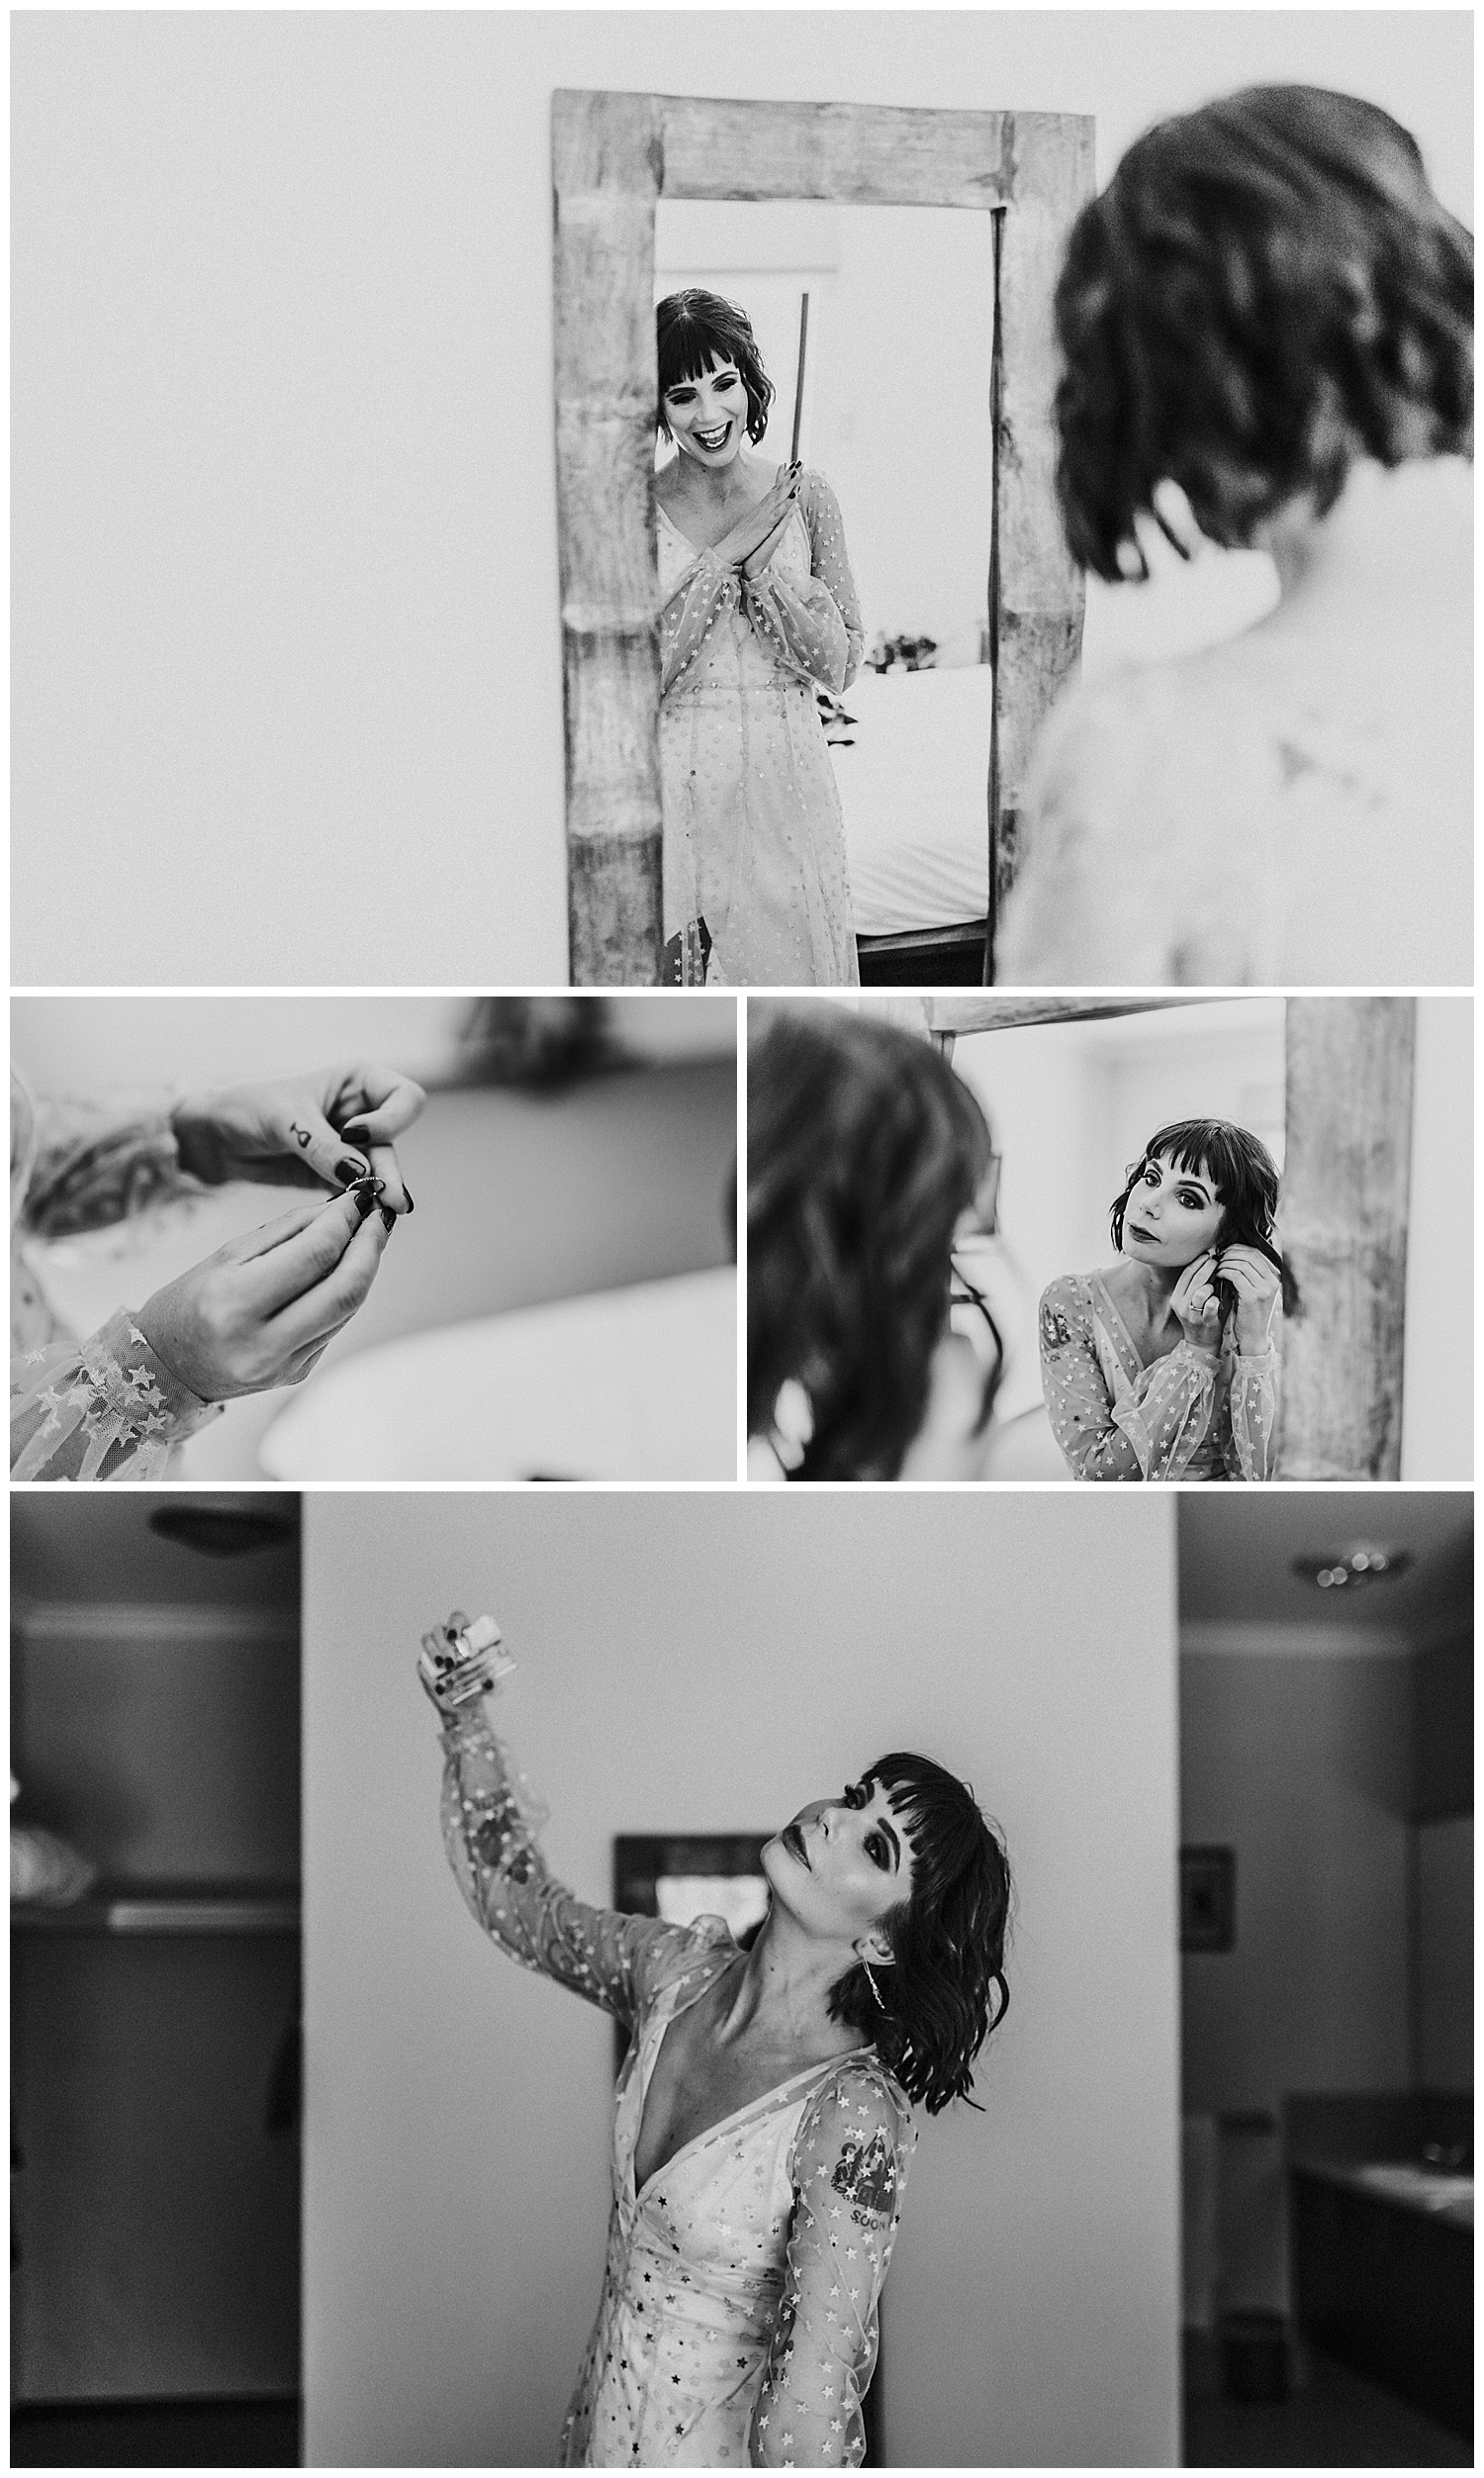 katie_jake_keeper_creative_wedding_photographer_10.JPG